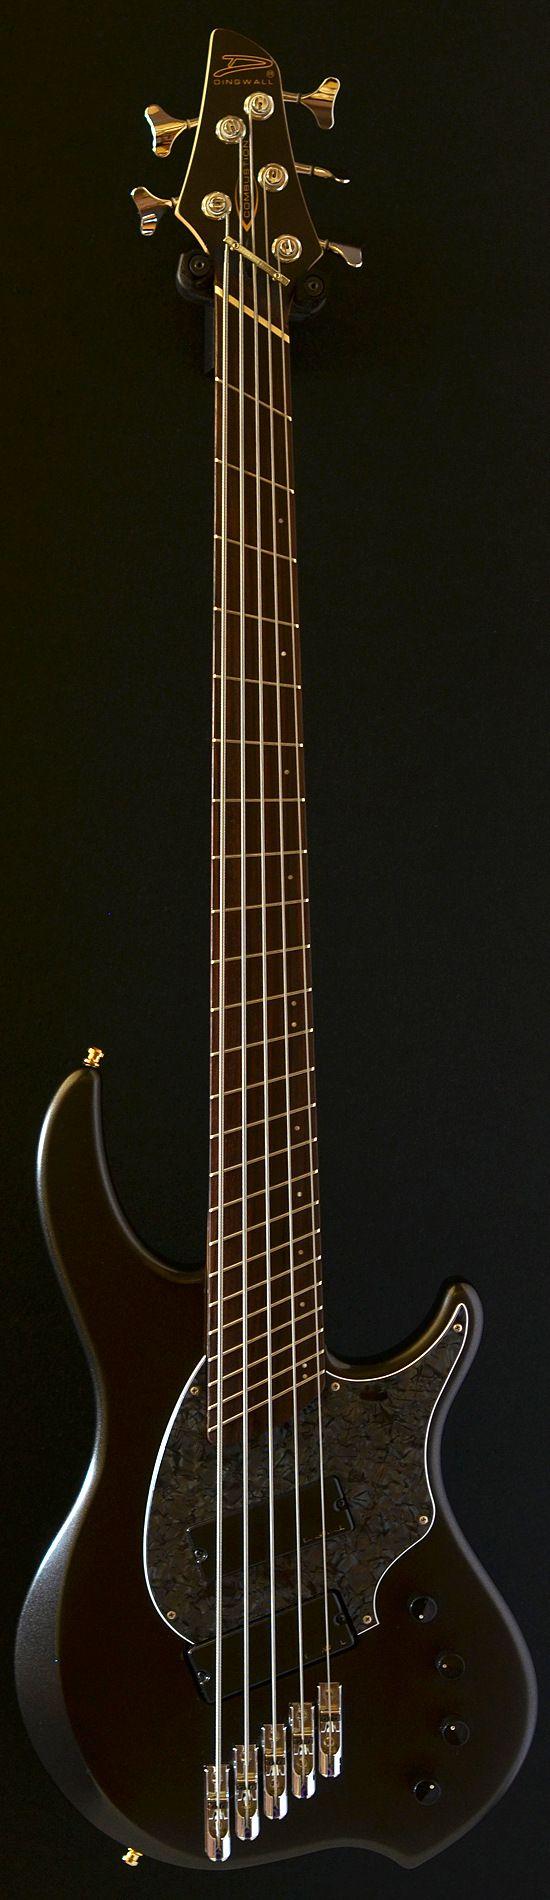 Dingwall Combustion 5 String Satin Black